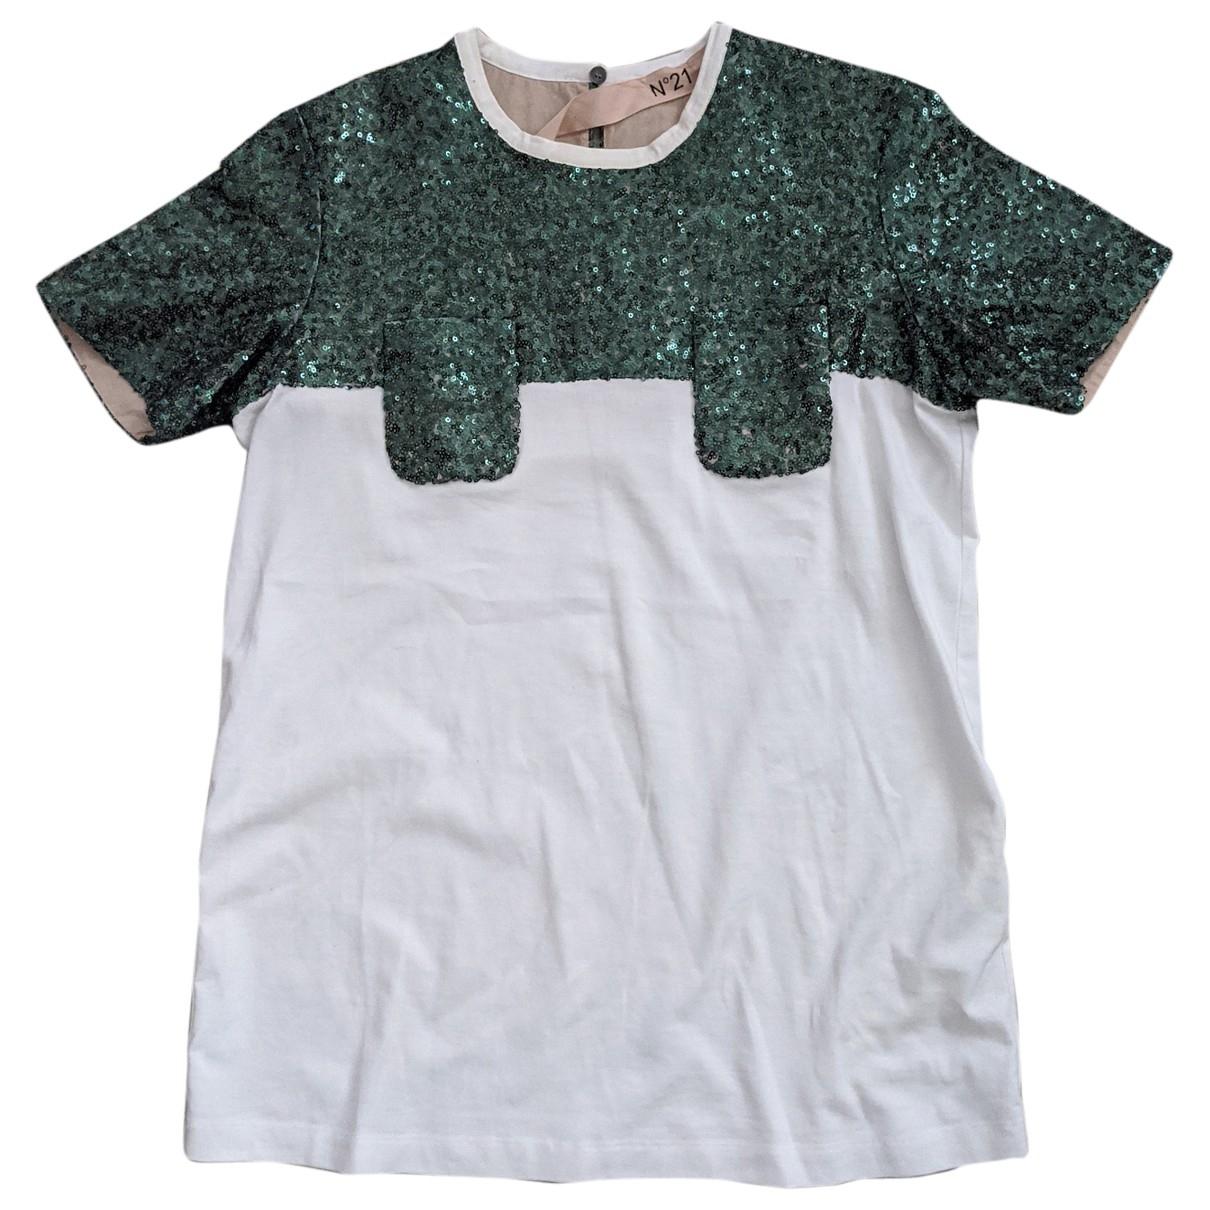 N°21 \N Green Cotton  top for Women 40 IT